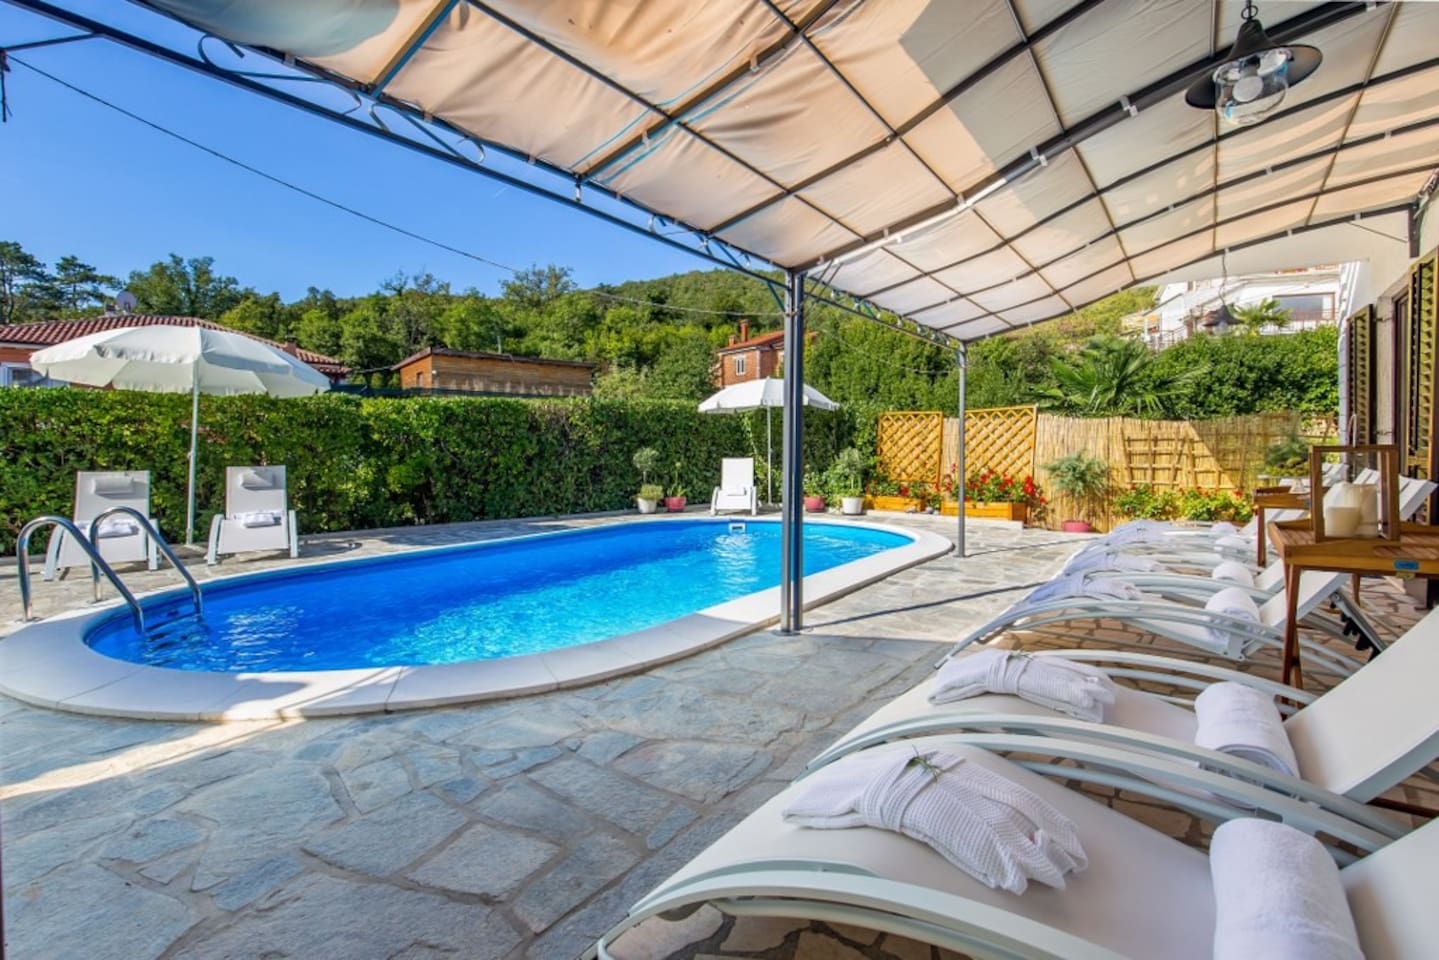 Private pool 7 x 3,5 m :-)